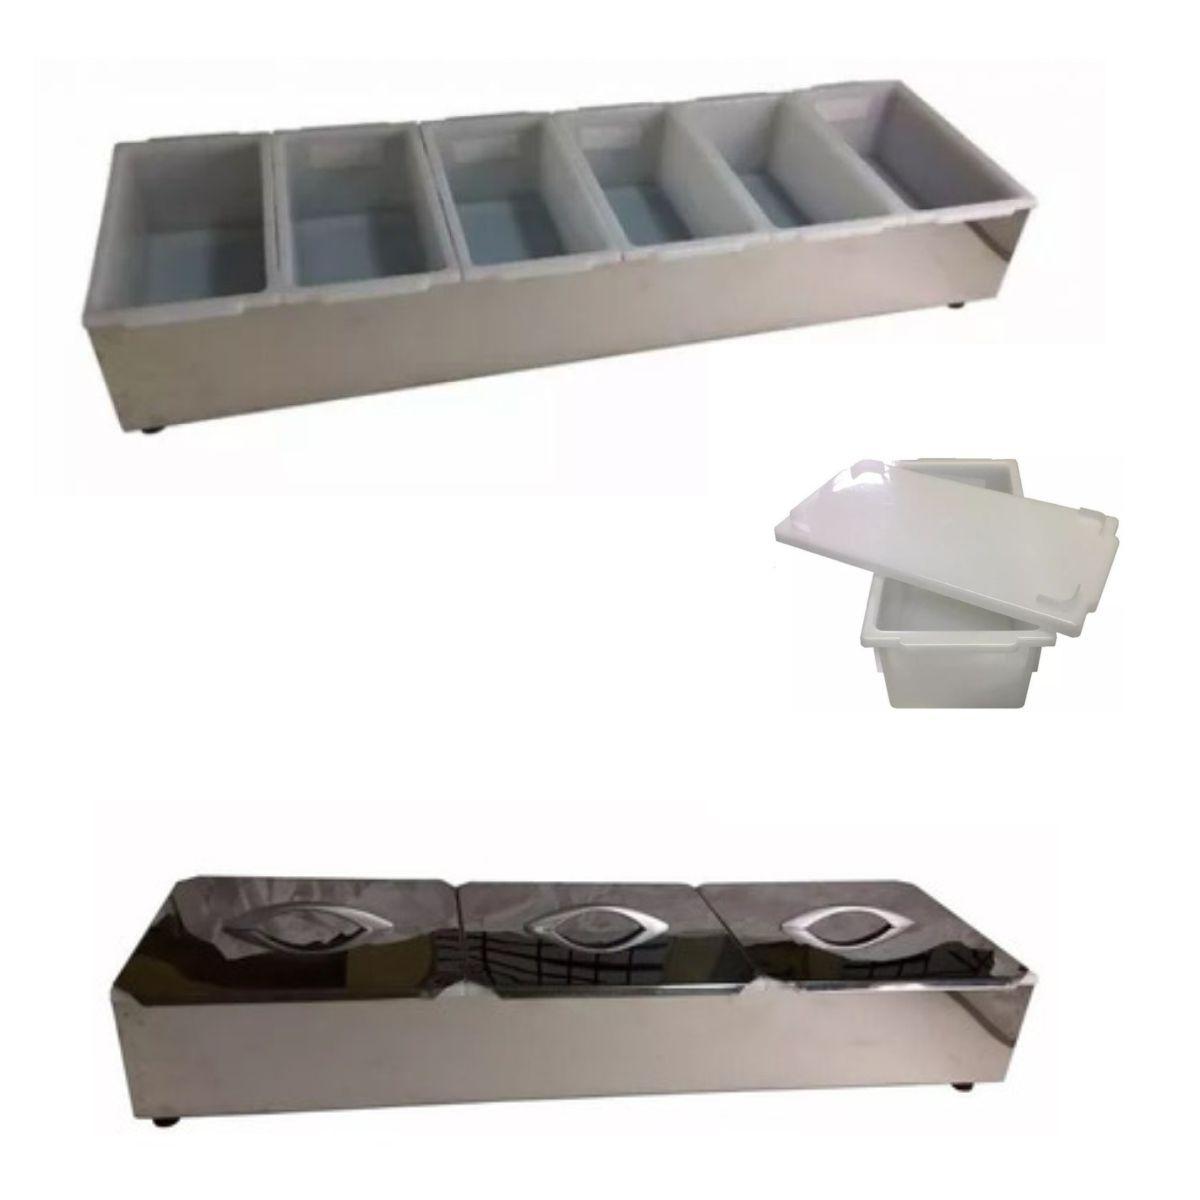 PIZZAROLA 6 CAIXAS PLASTICAS  - EKENOX- Equipamentos Industriais